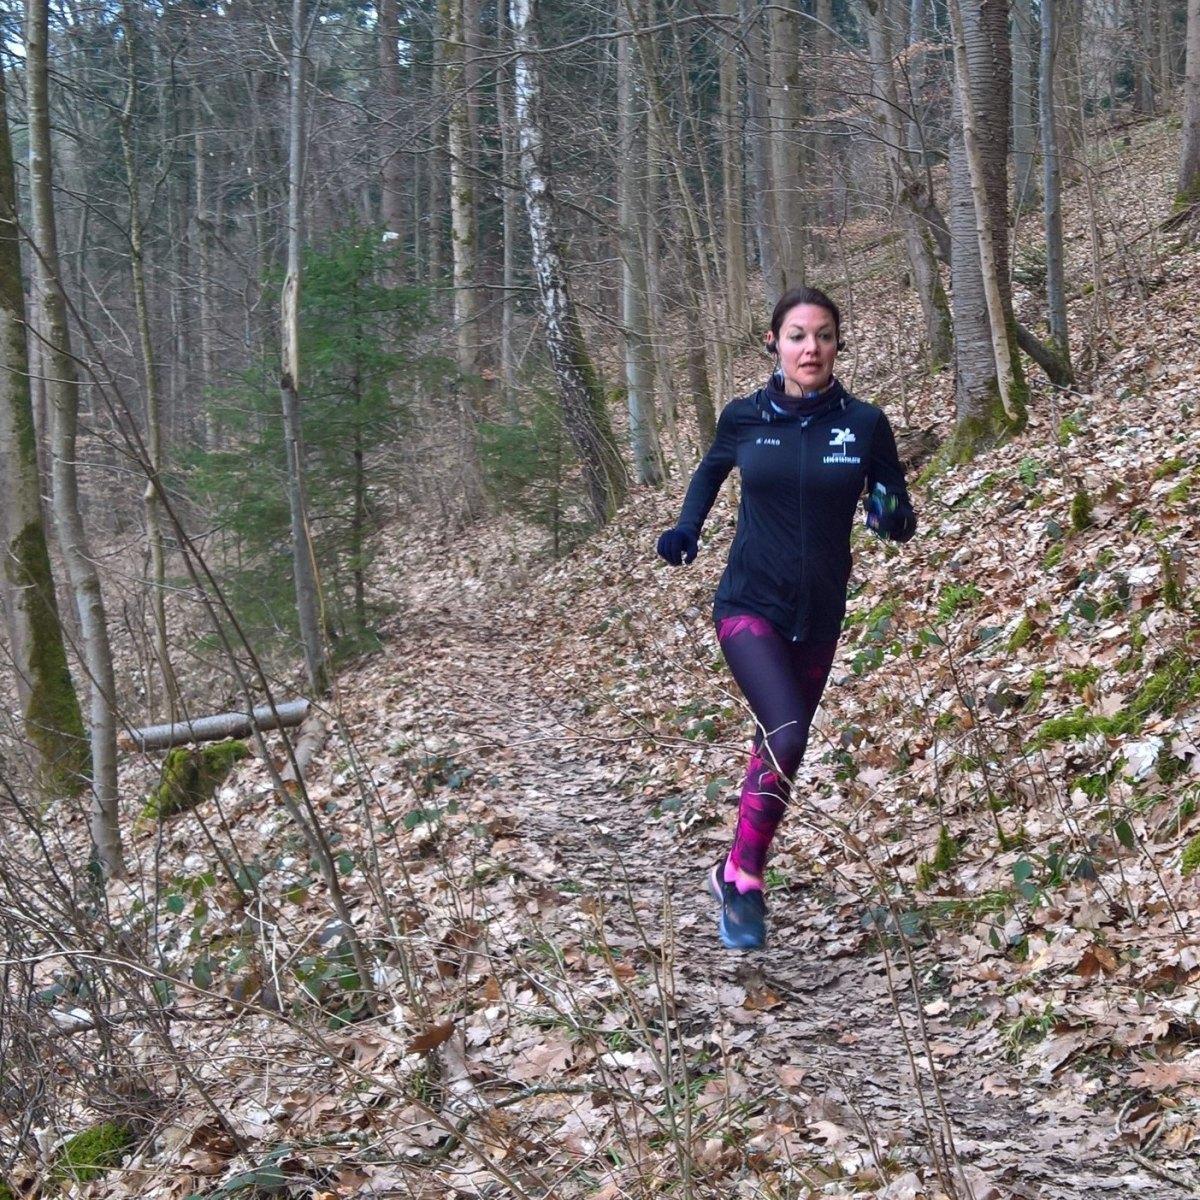 Andrea Rothmund in Stockach